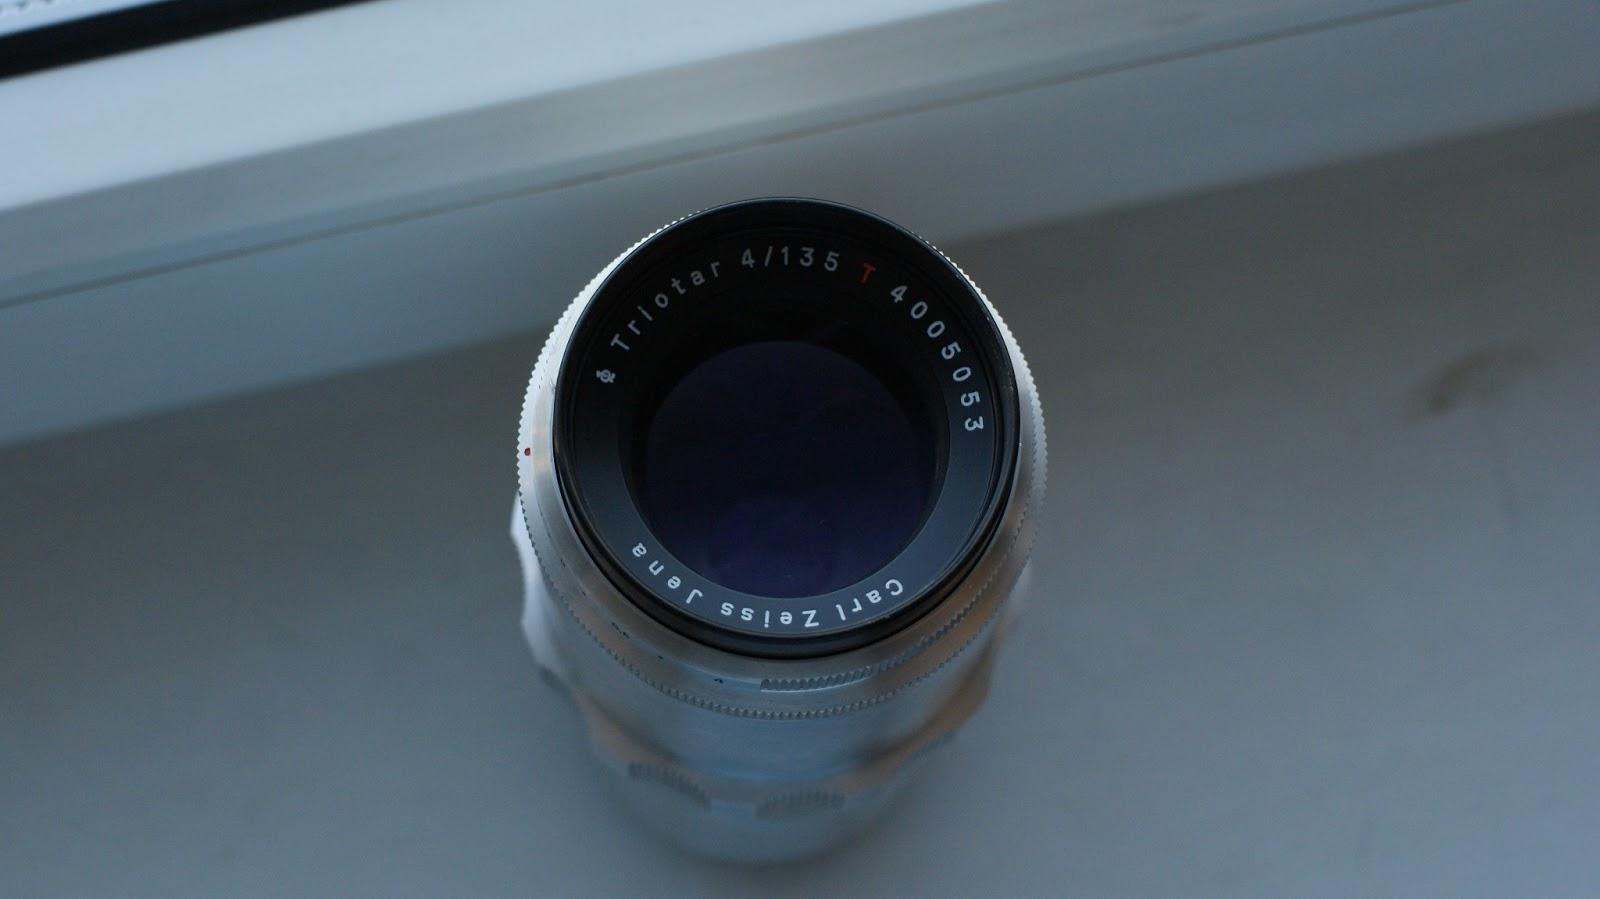 Carl Zeiss Jena Triotar 135mm f4